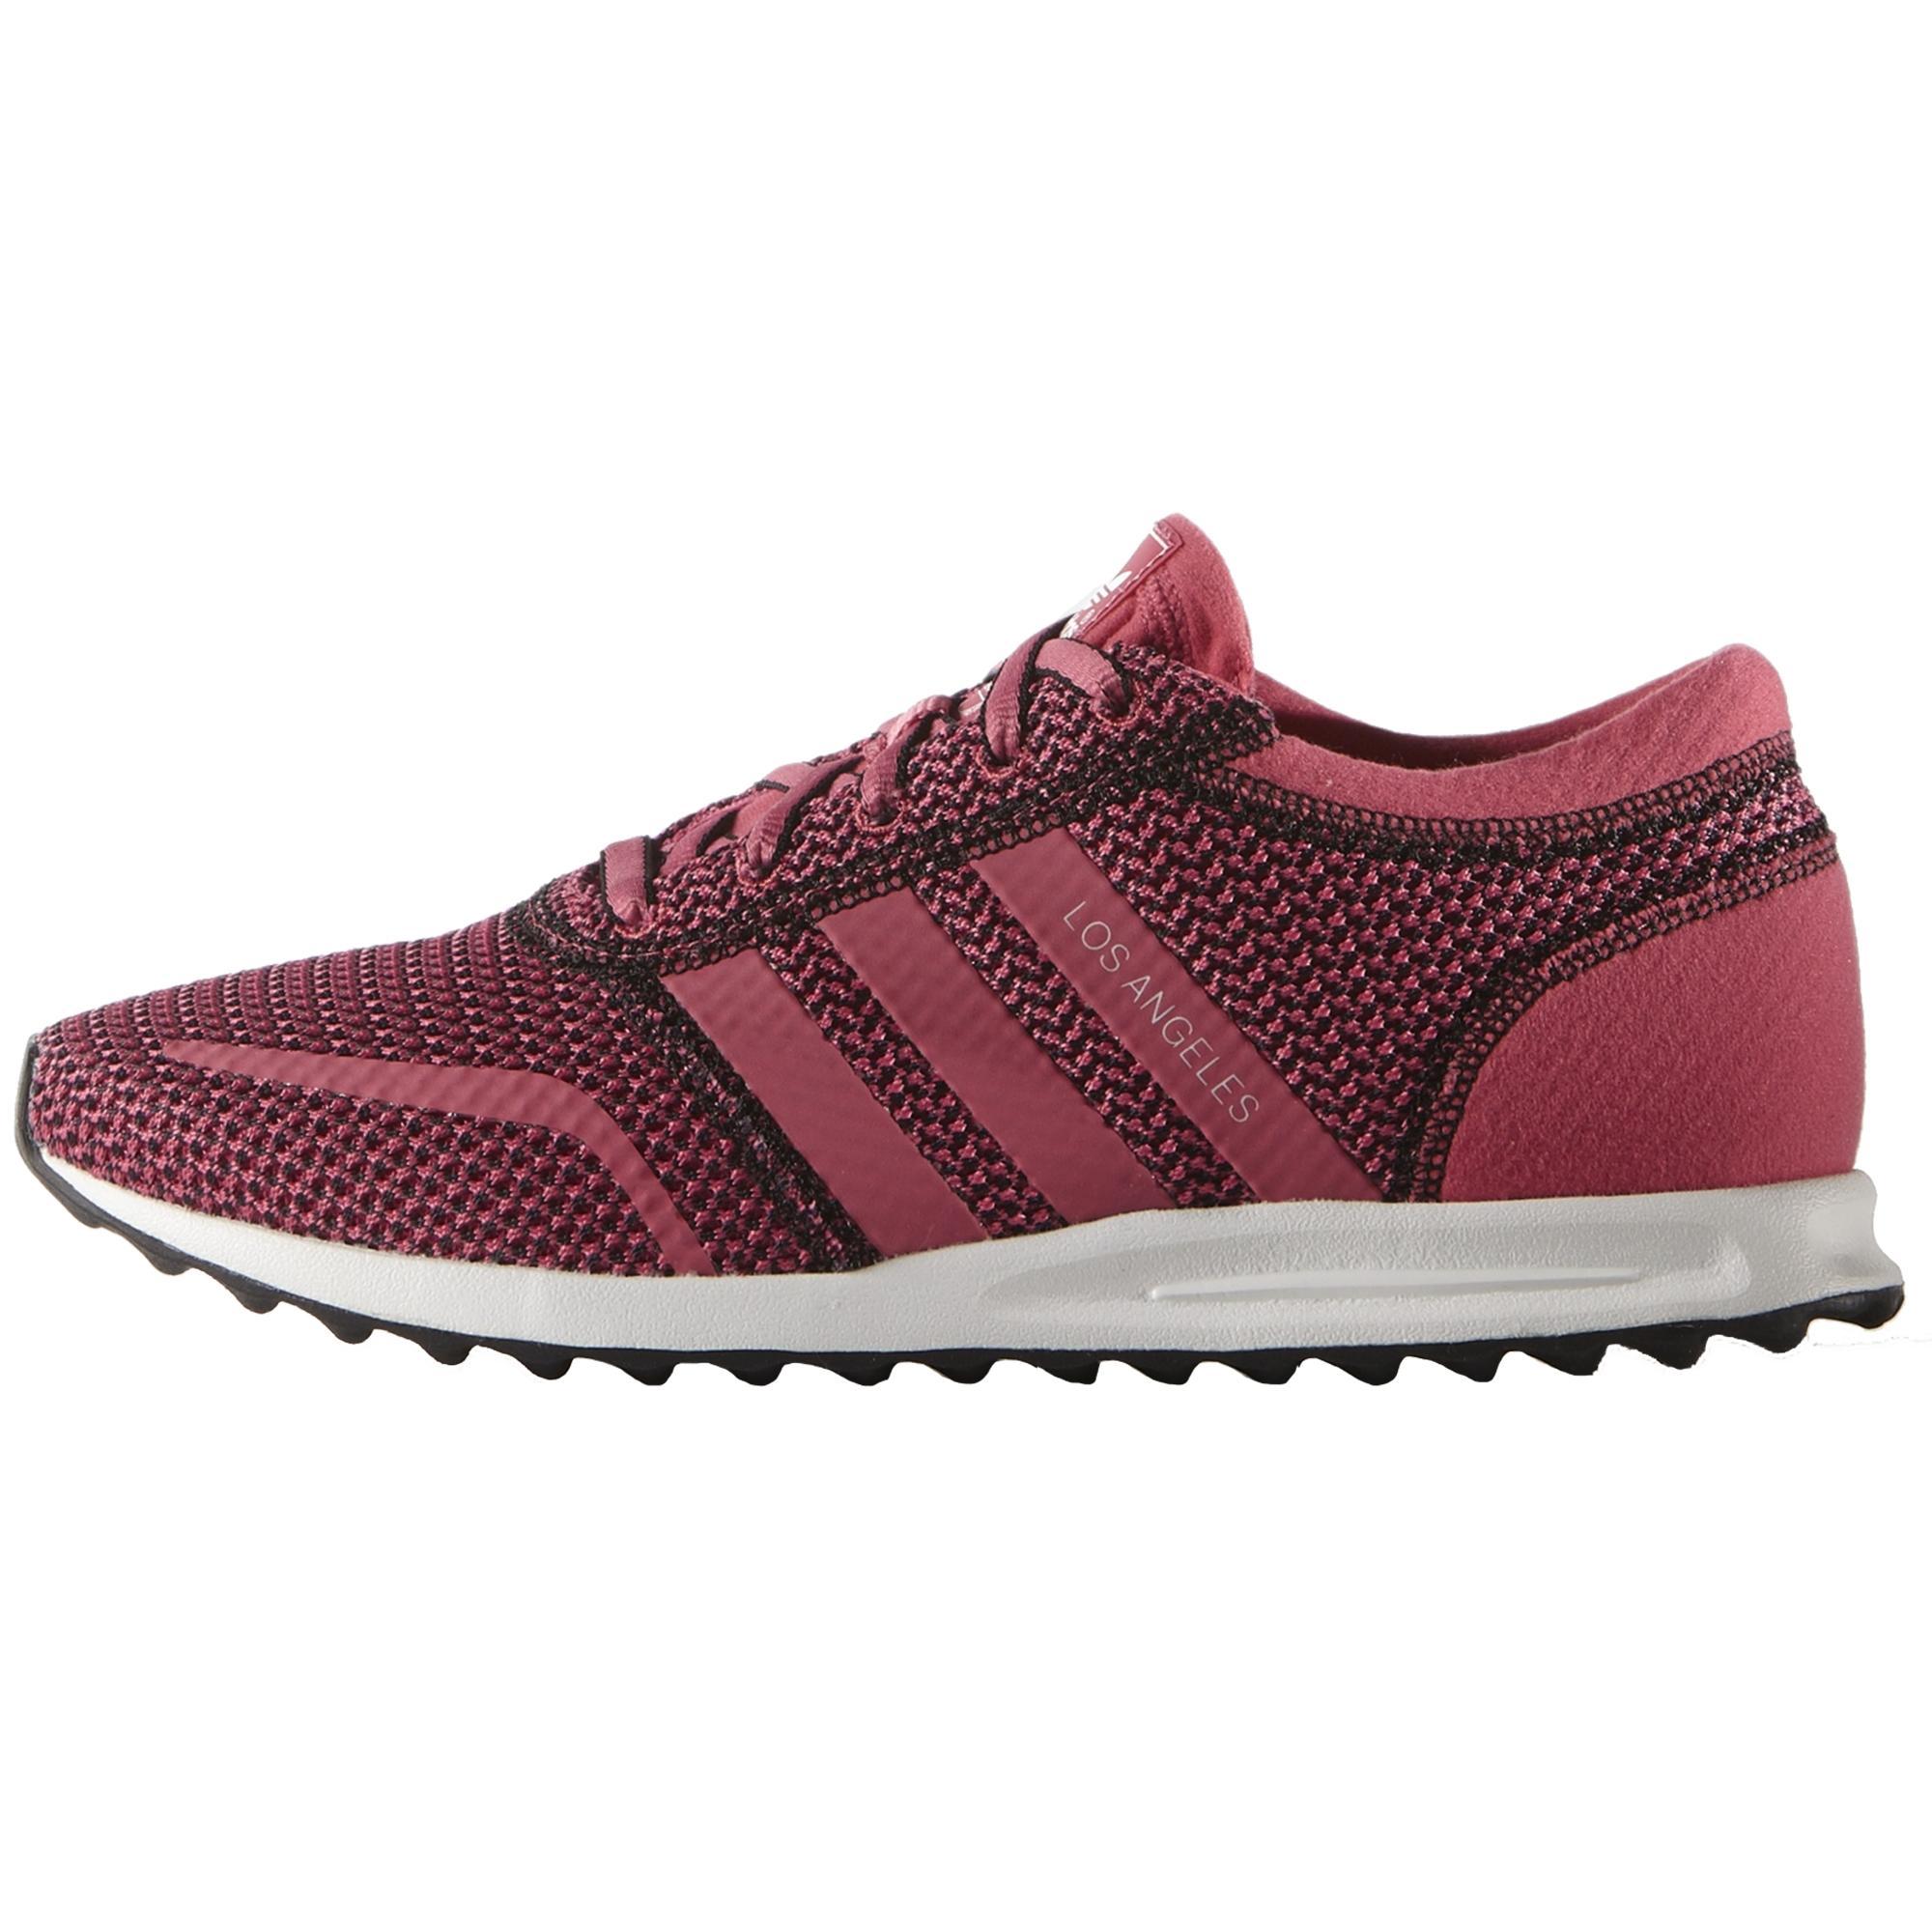 adidas Los Angeles Kadın Spor Ayakkabı